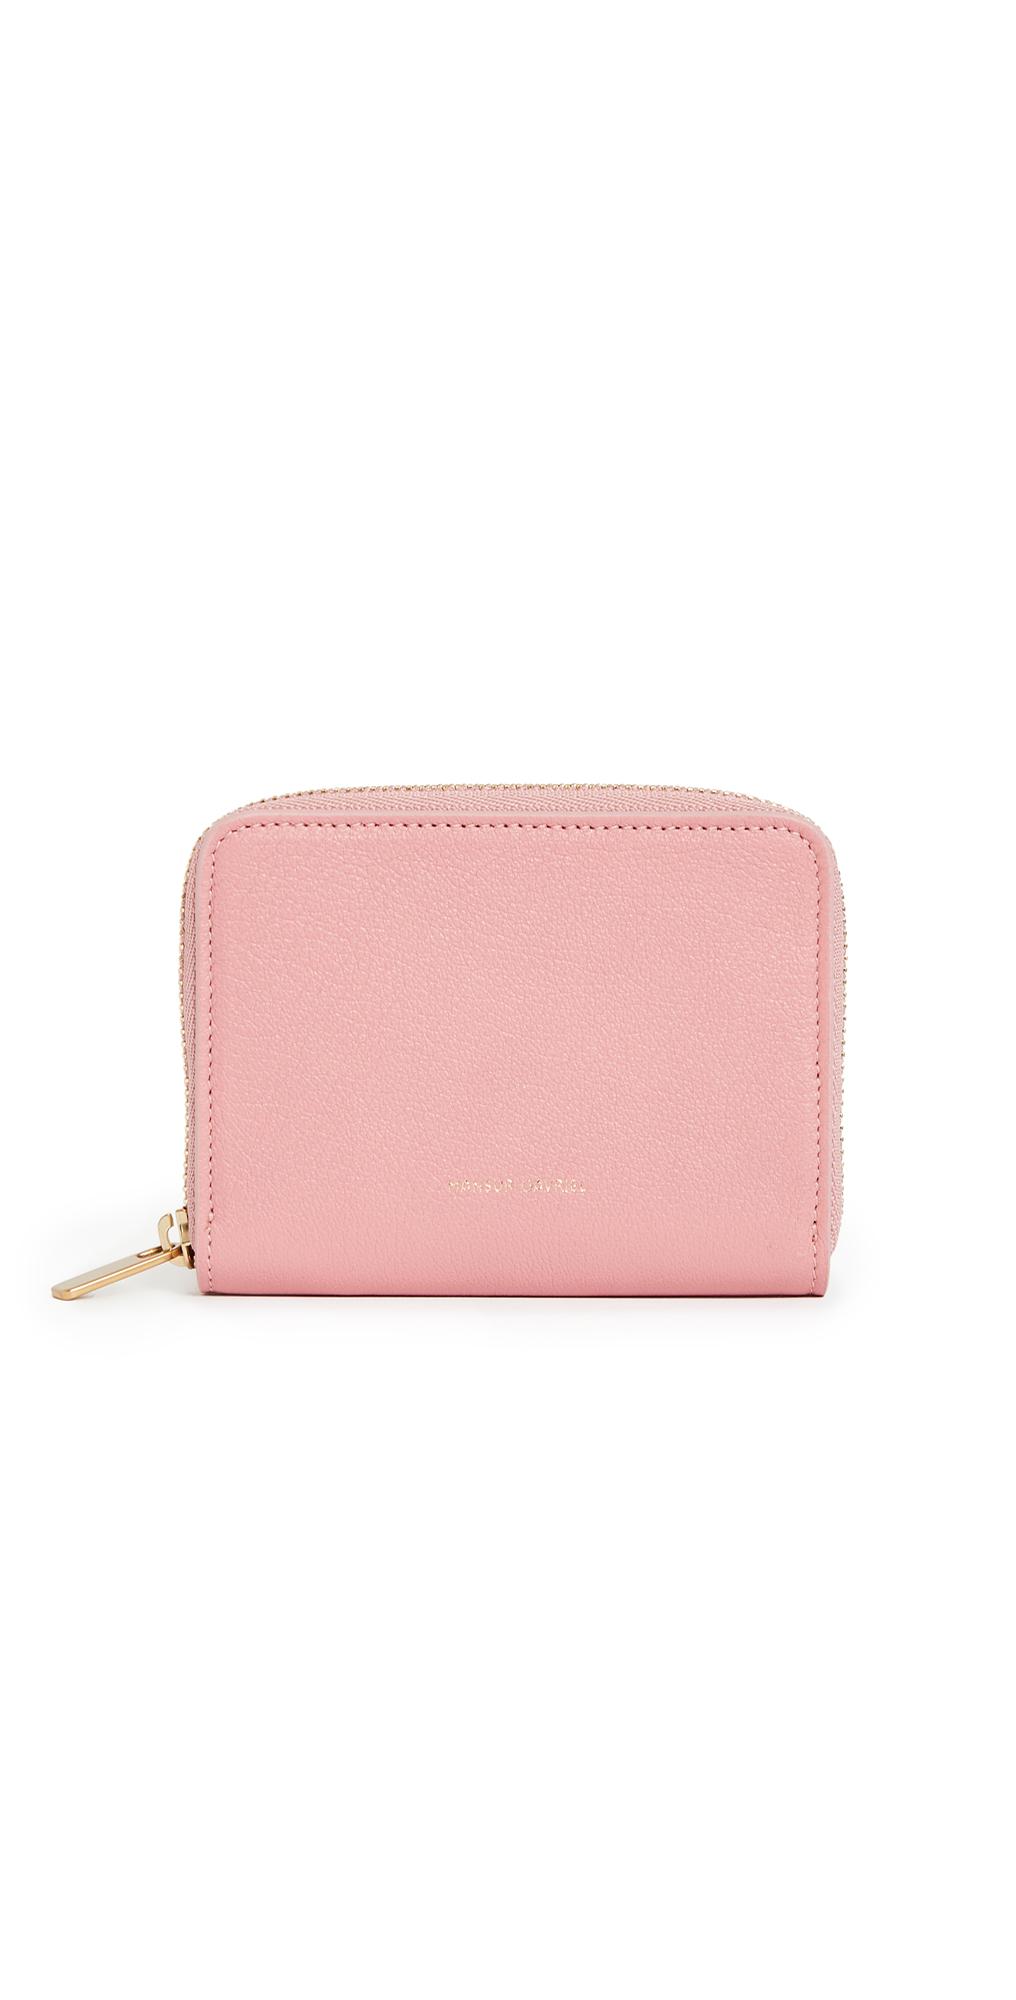 Mansur Gavriel Compact Zip Wallet